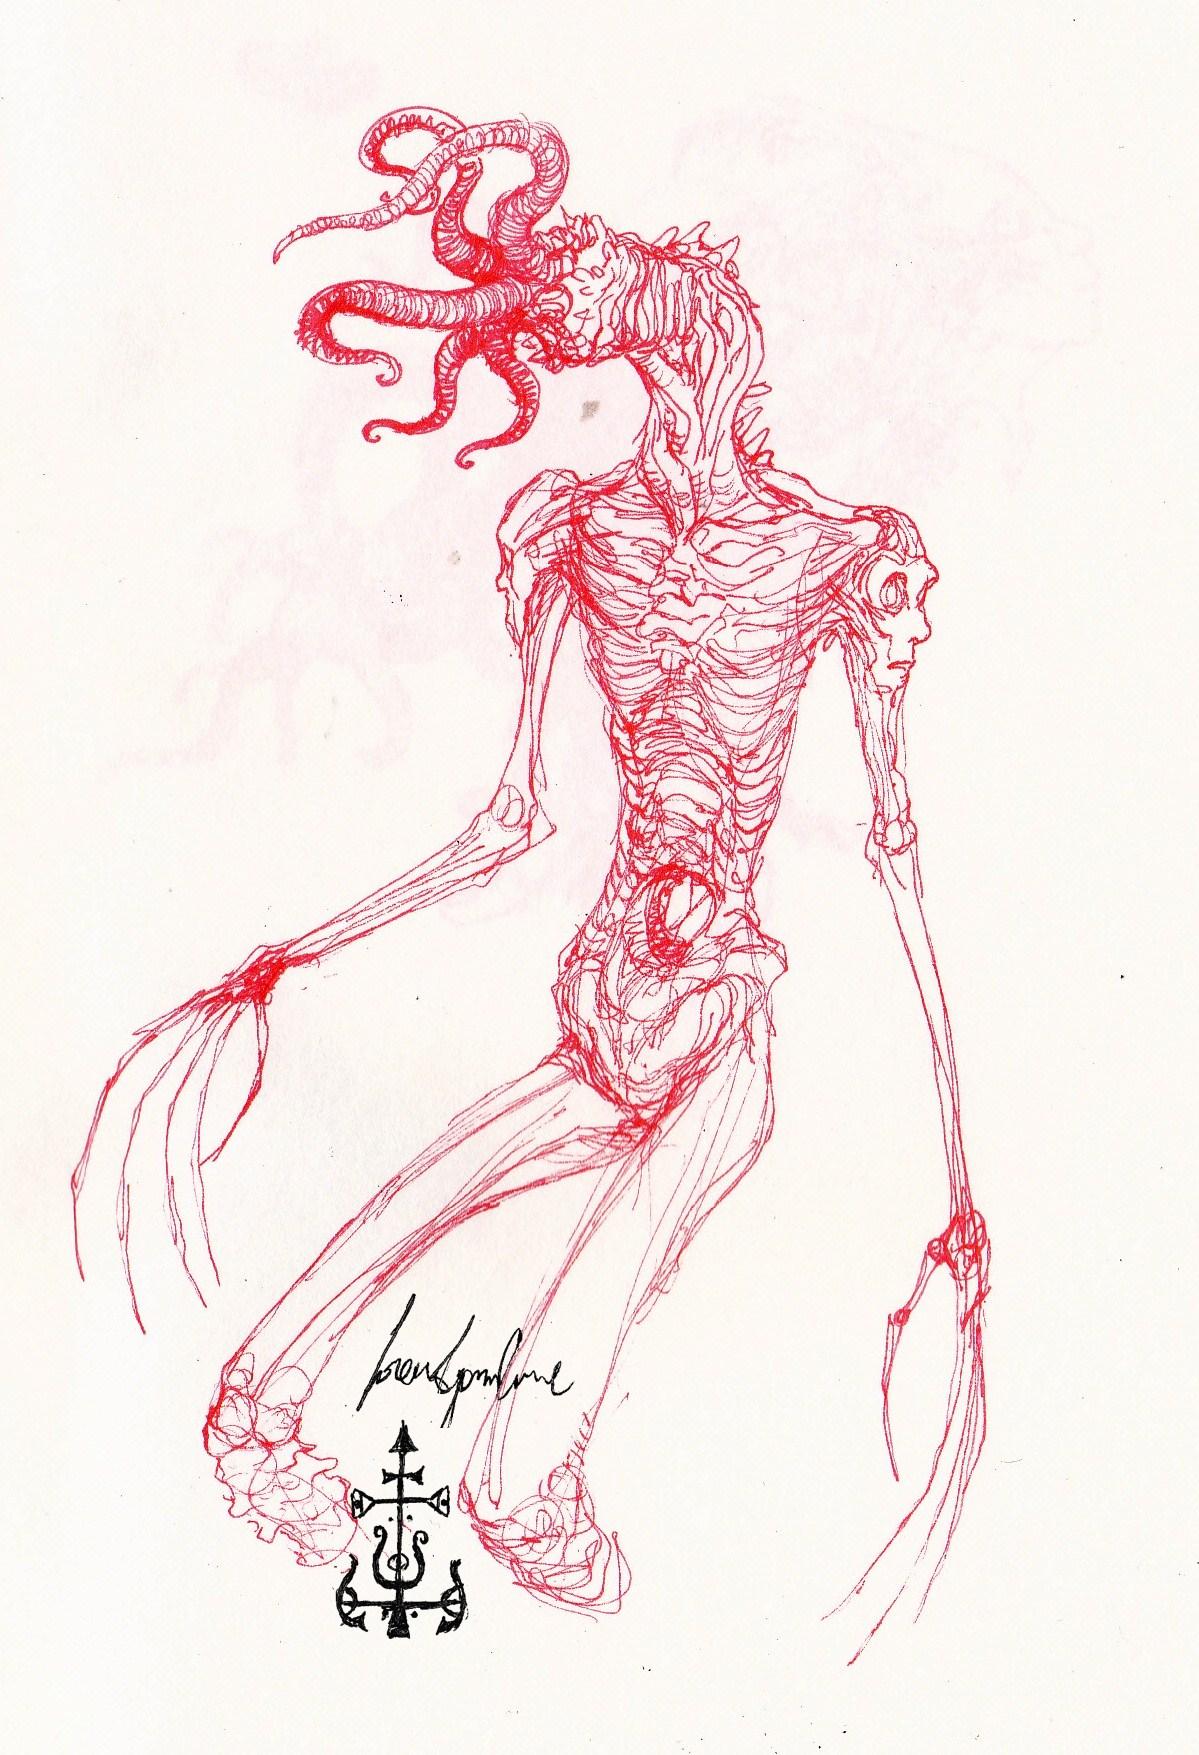 Red madness 12 by GarmrKiDar